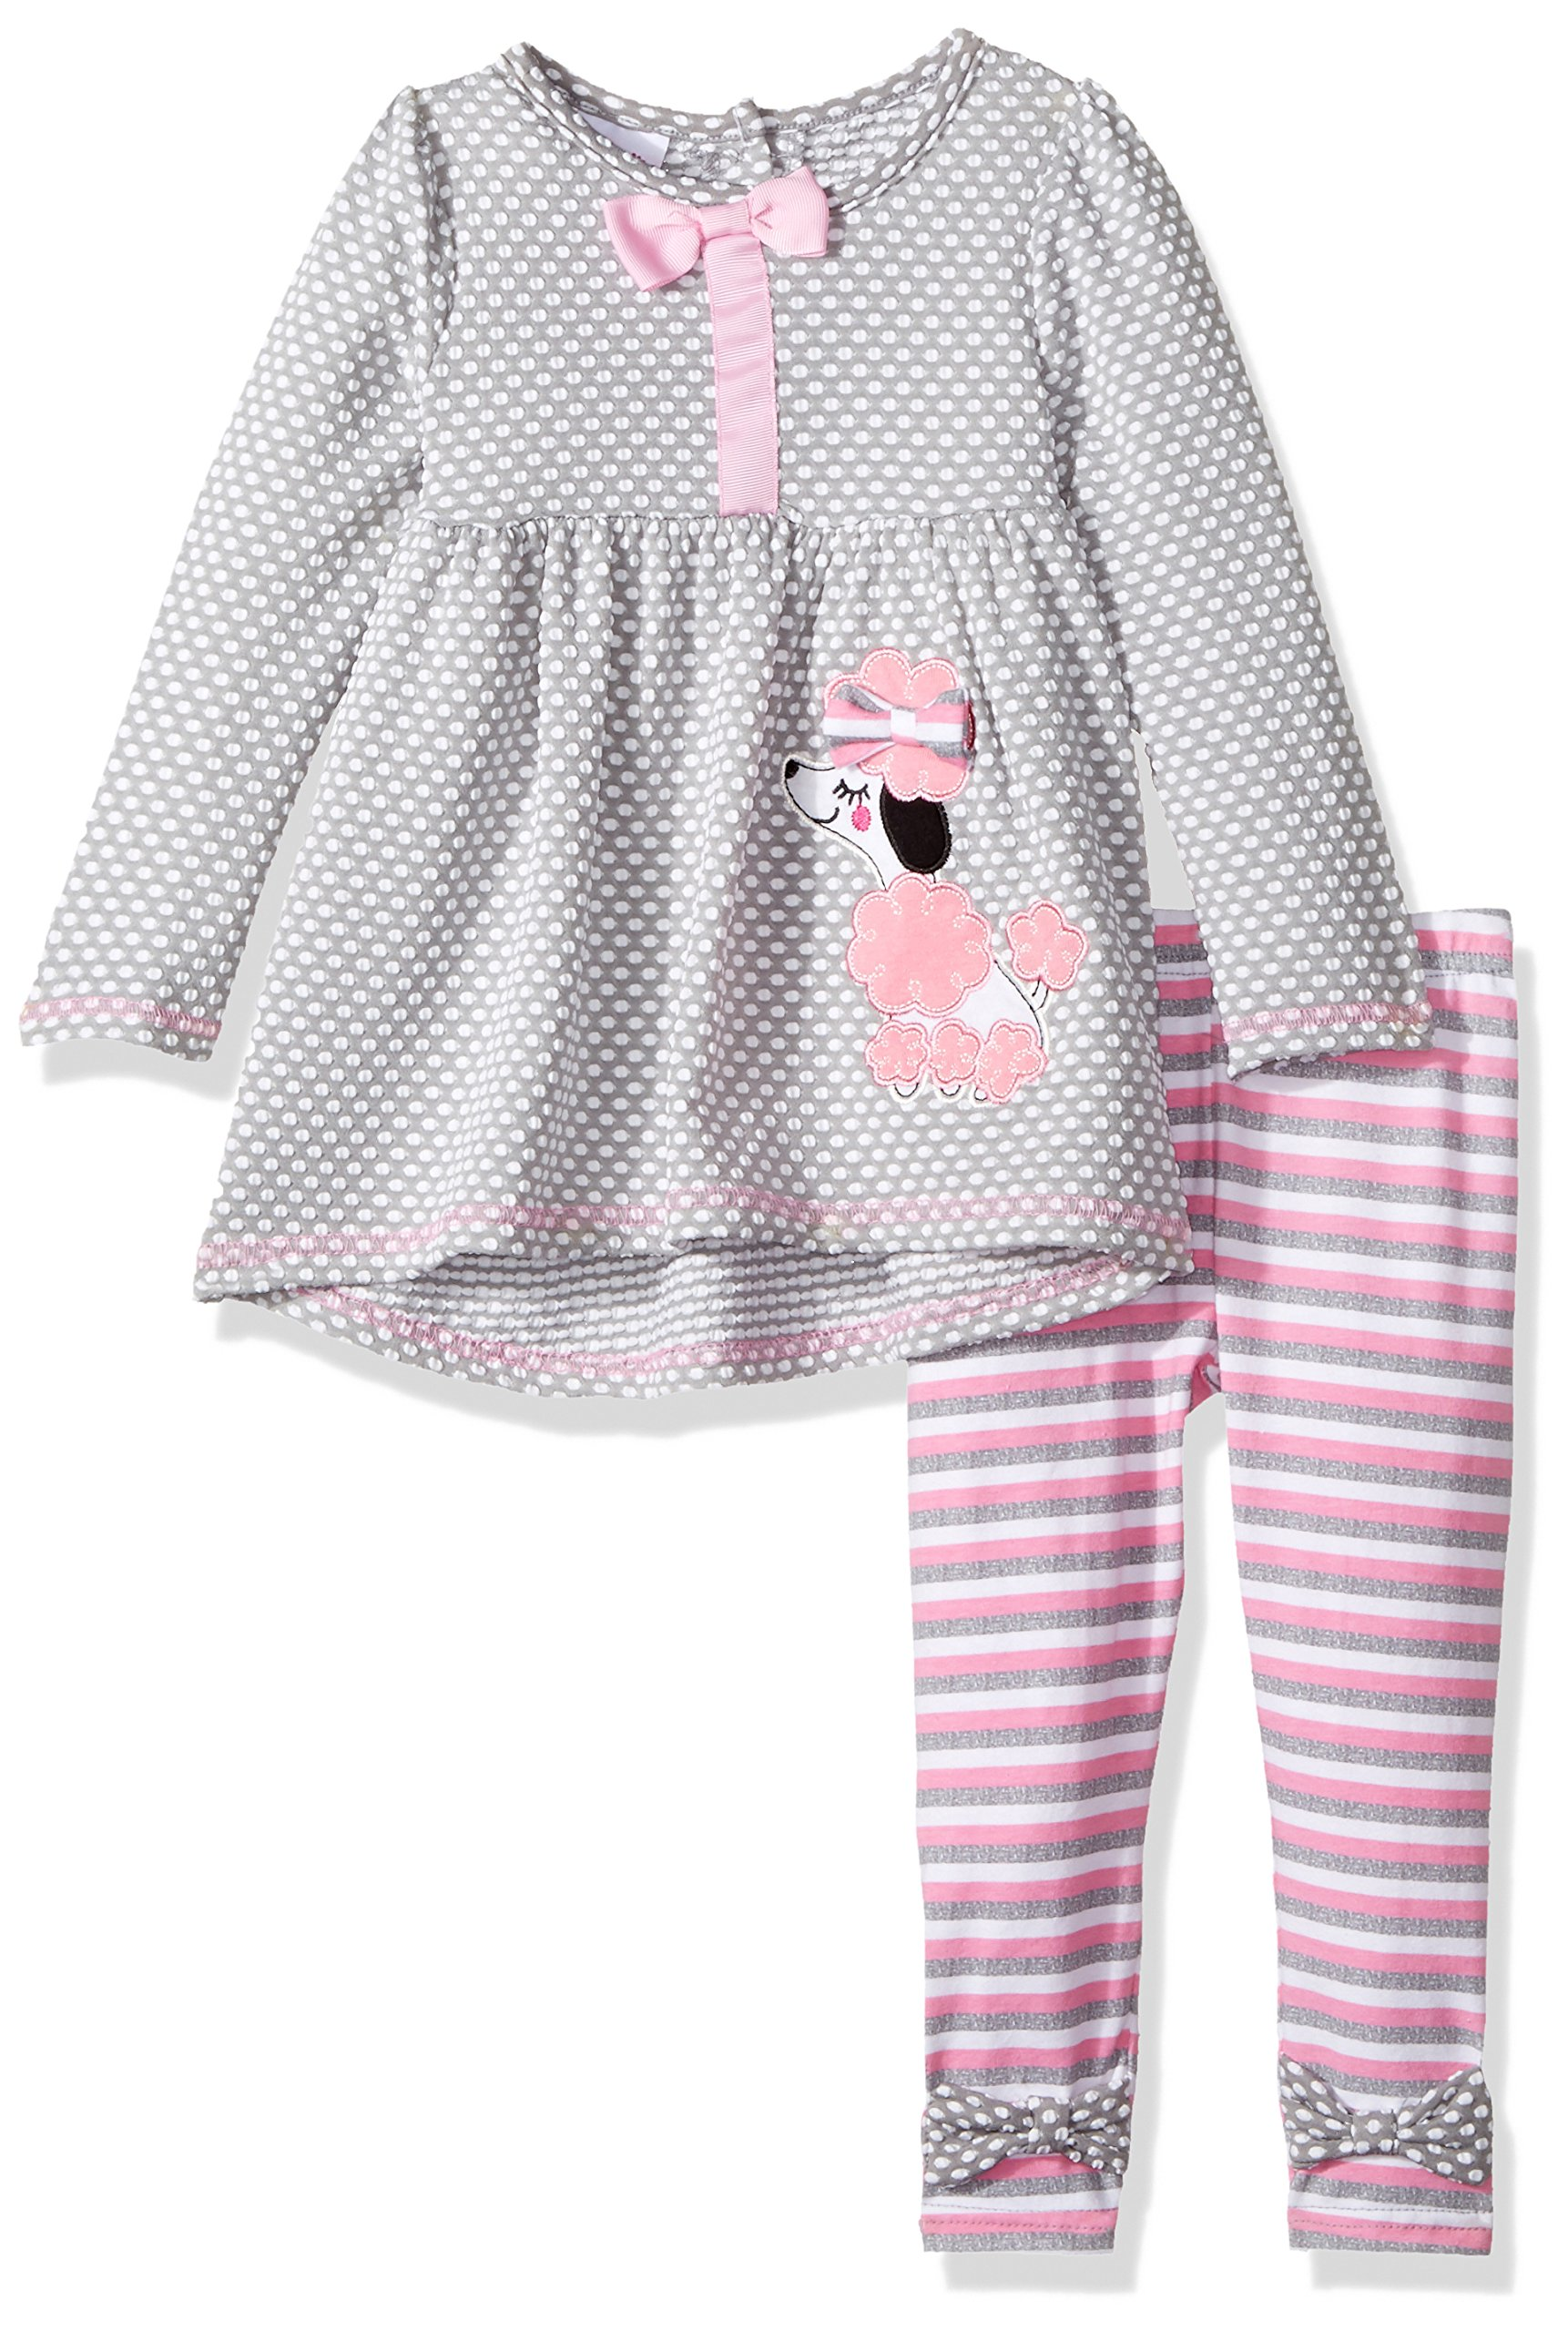 Nannette Baby Girls' Playwear Long Sleeve Top and Legging Set, Gray, 24m